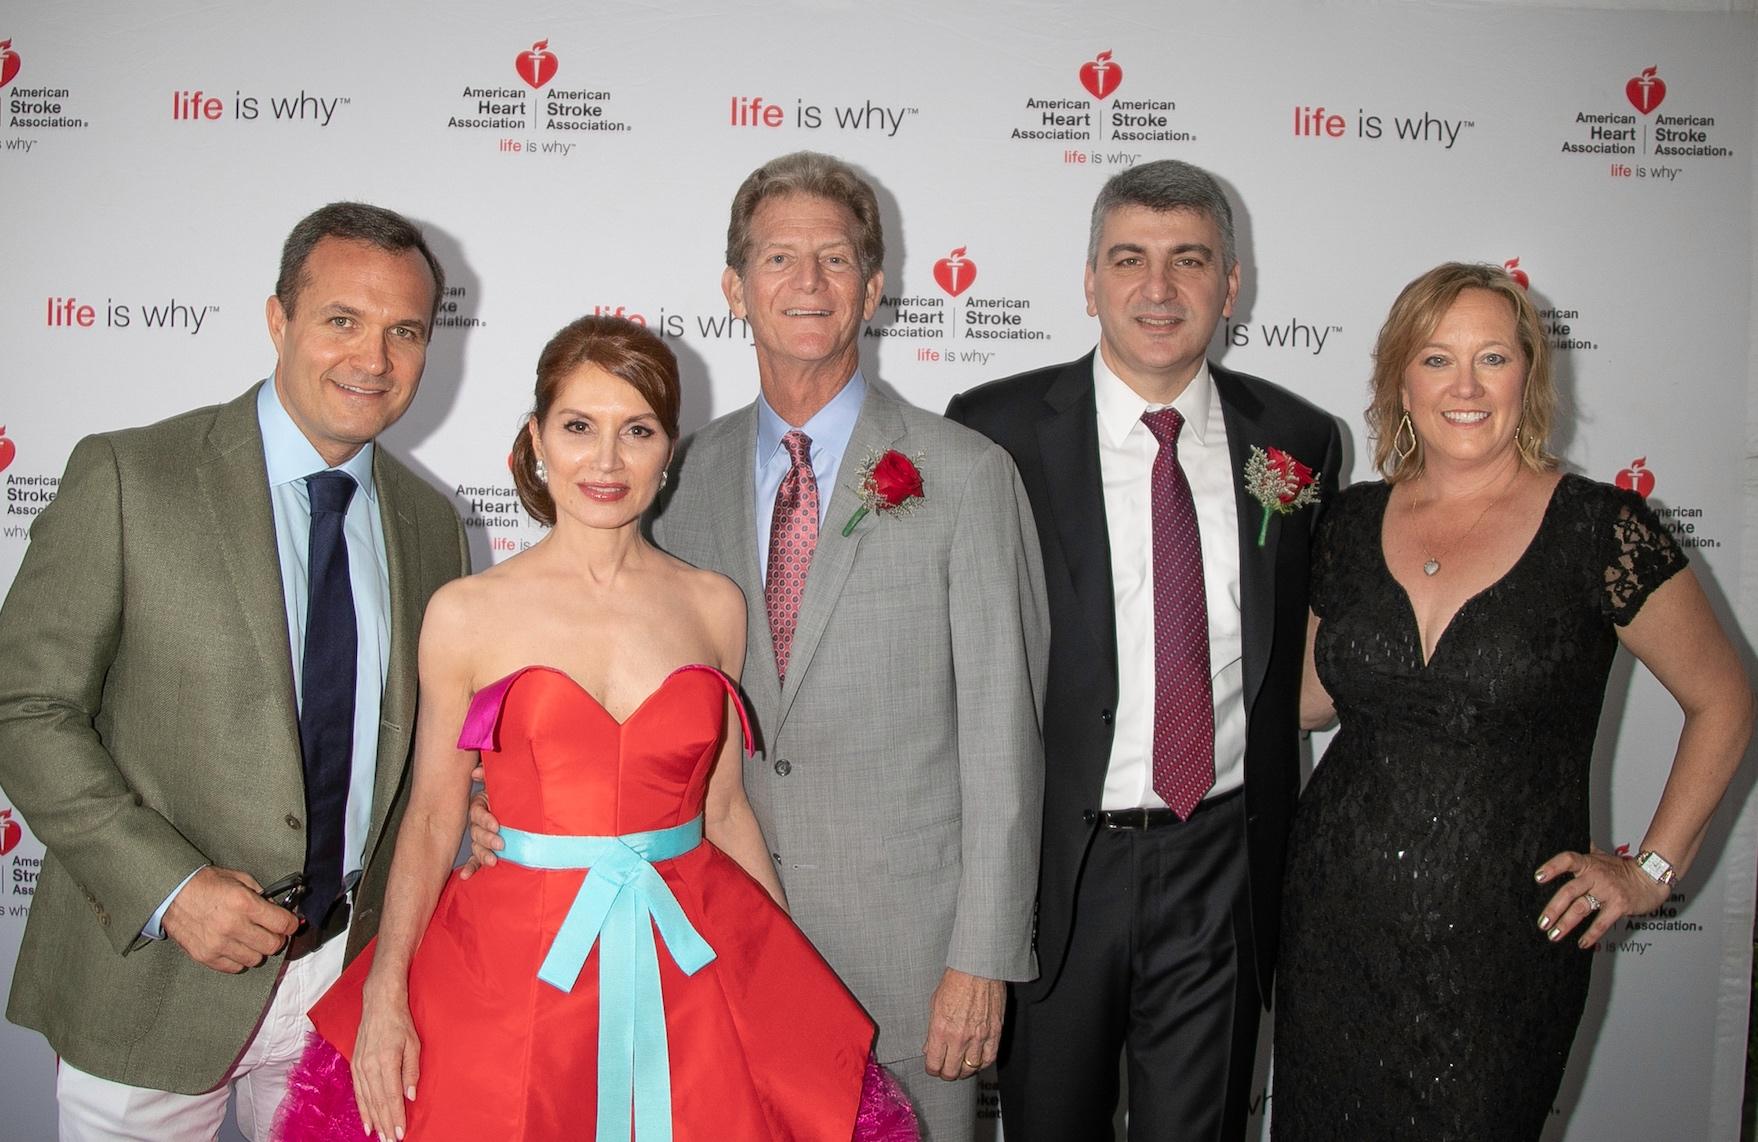 Greg Kelly, Jean Shafirof, Chuck Simonton, M.D, Dr. Apostolos K. Tassiopoulos and Barbara Poliwoda